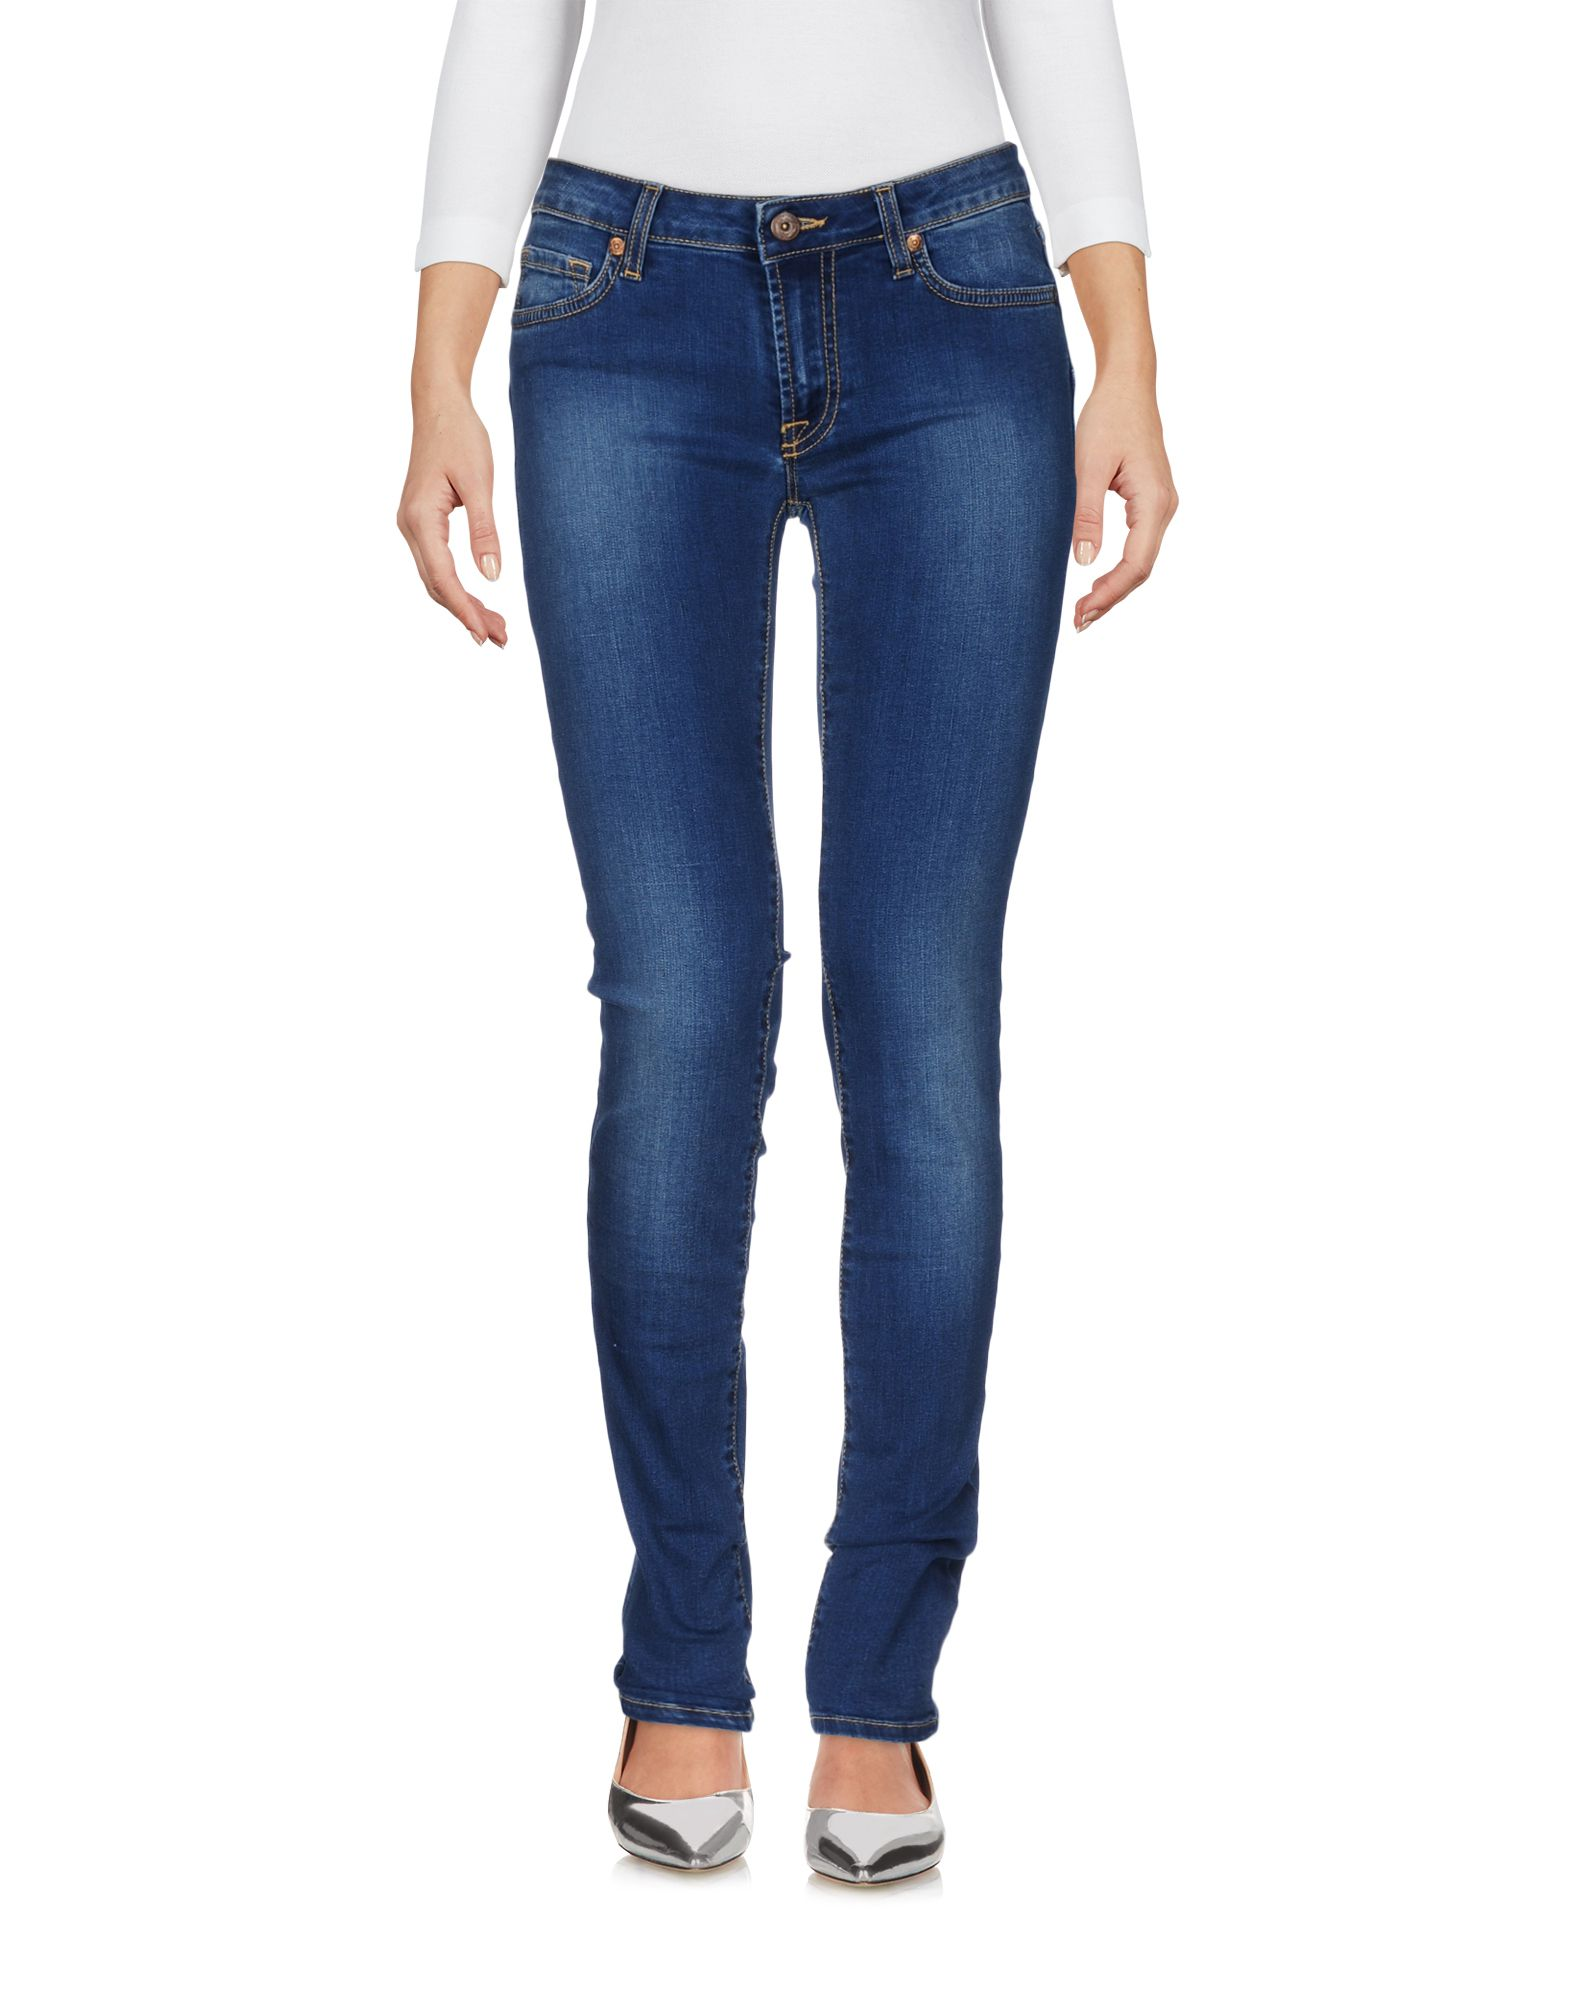 Pantaloni Jeans Roÿ Roger's Donna - Acquista online su raTqA